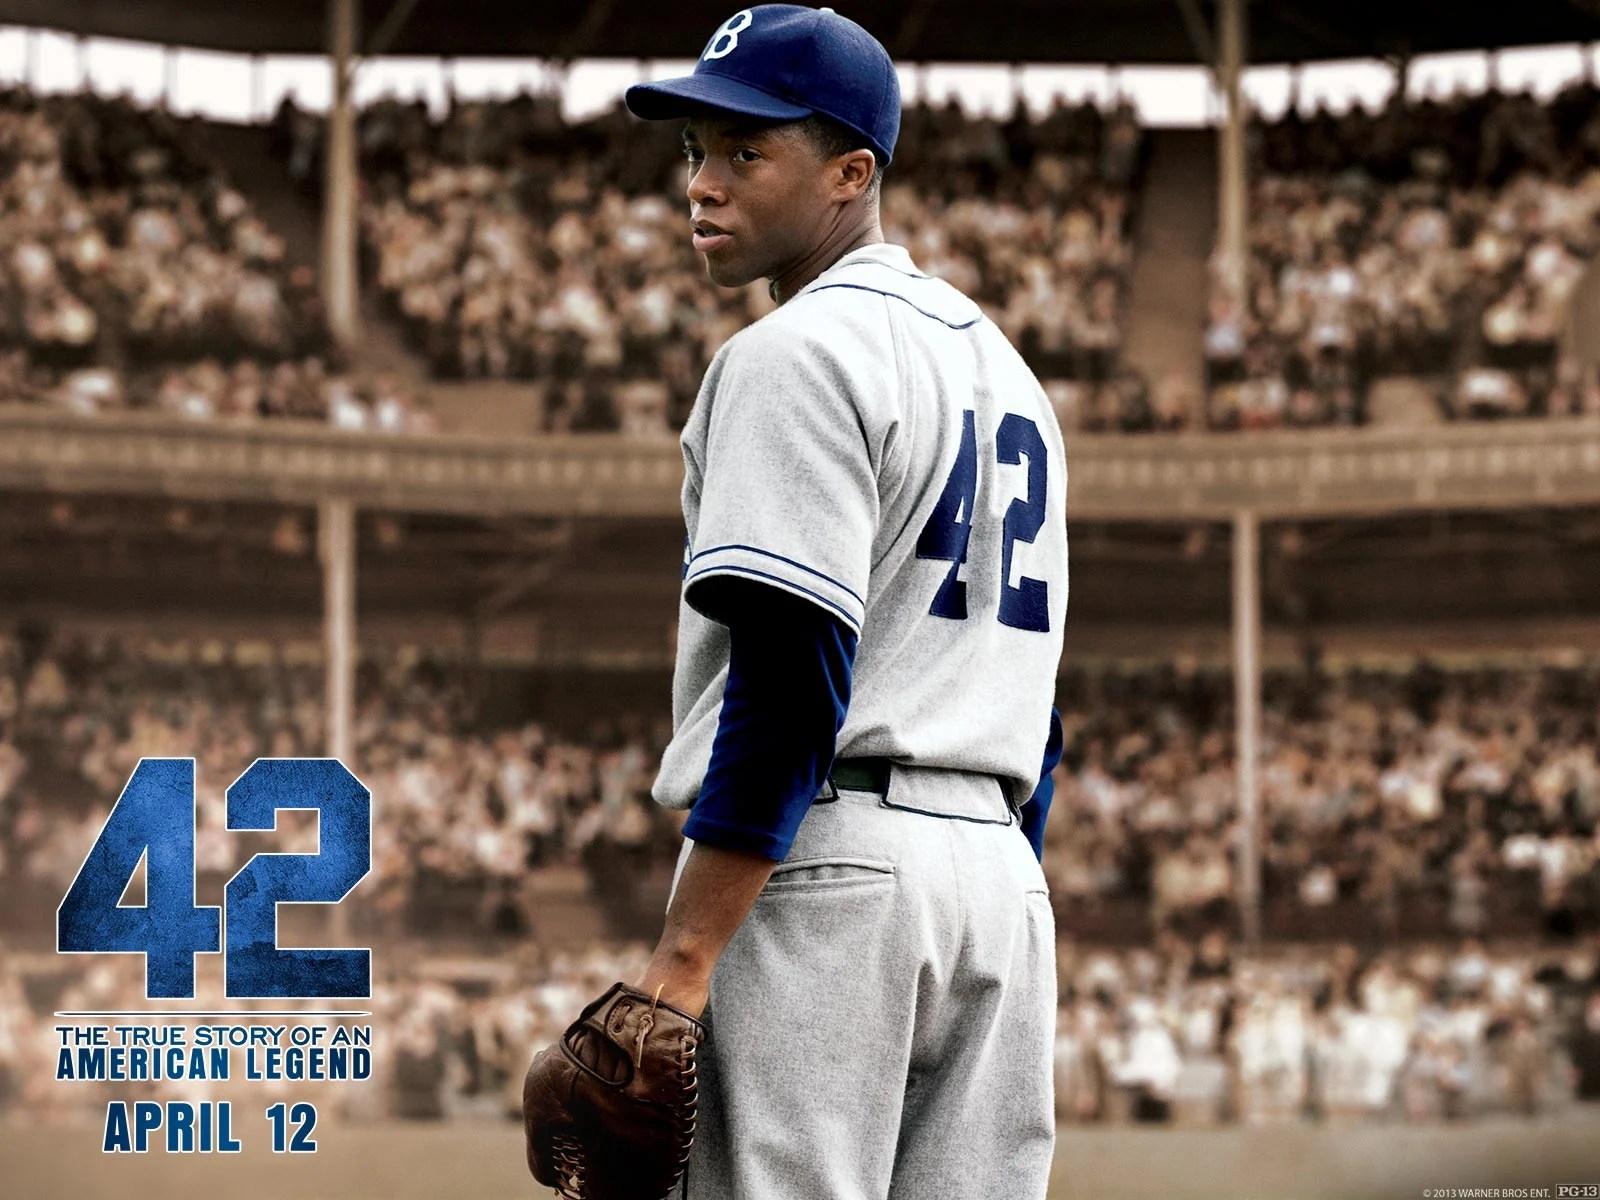 Jackie Robinson S Faith Missing From 42 Movie